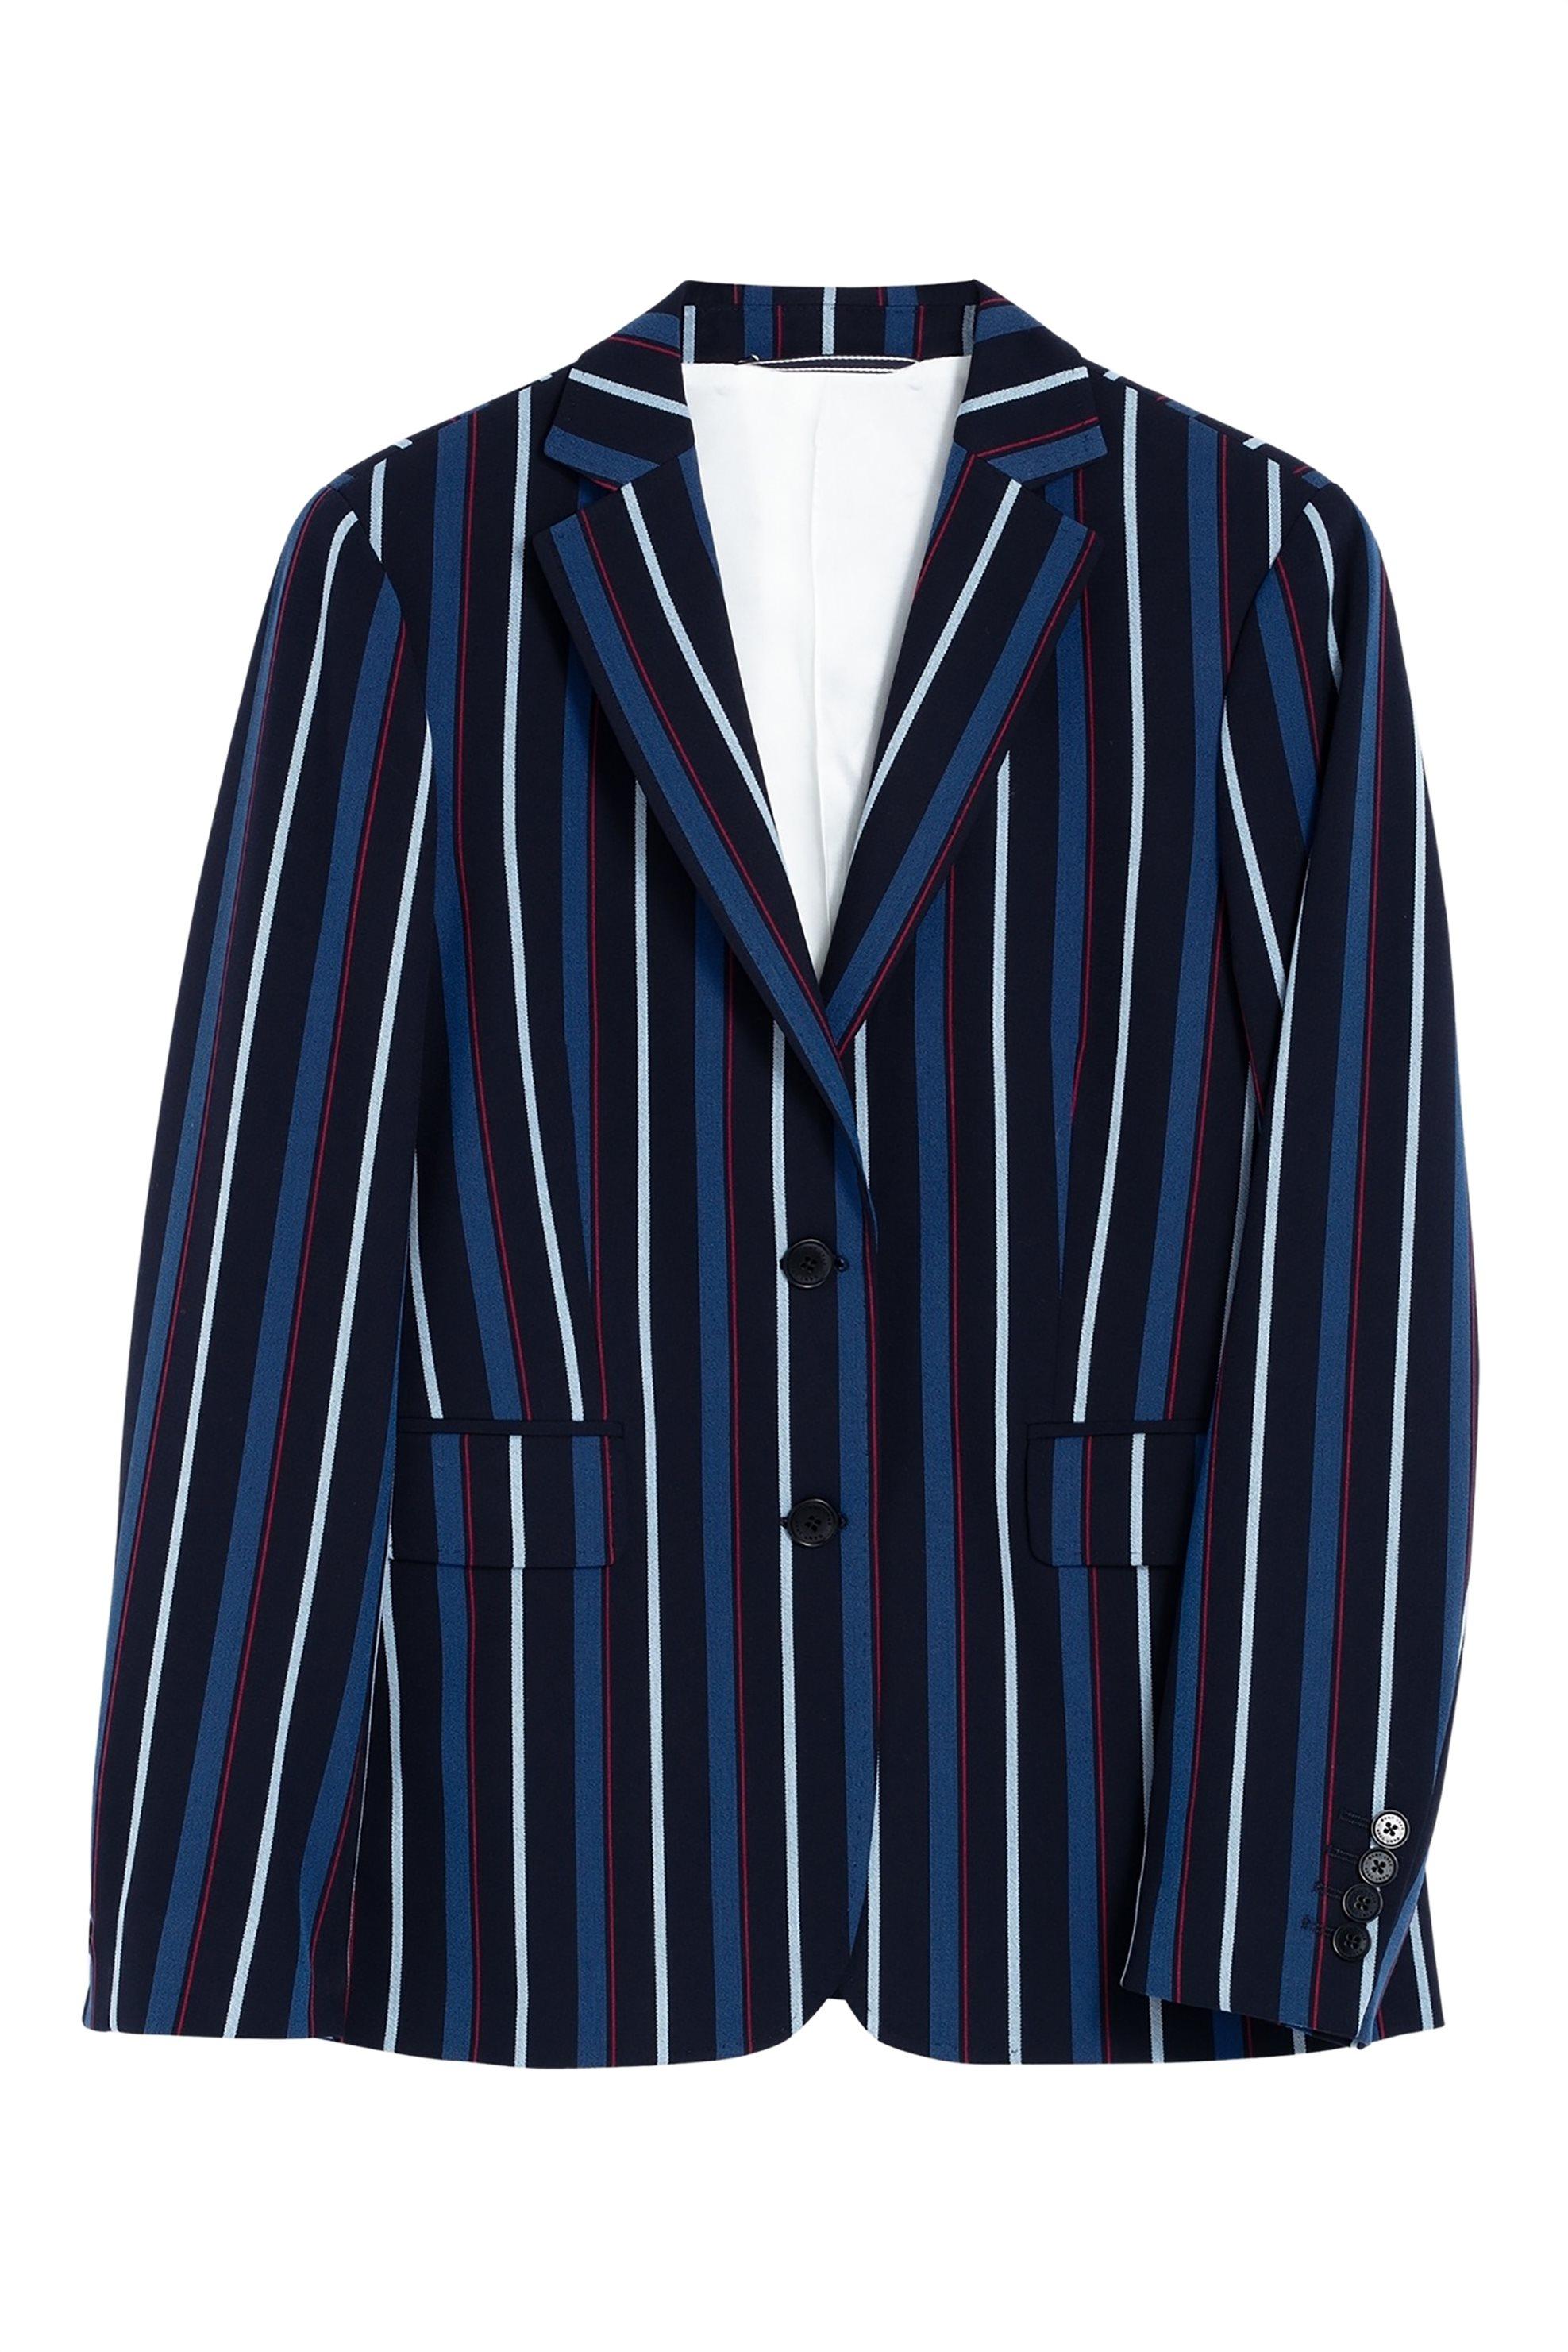 Gant γυναικείο ριγέ σακάκι Washable Regimental Stripe - 4770043 - Μπλε Σκούρο γυναικα   ρουχα   πανωφόρια   μπουφάν   σακάκια   σακάκια